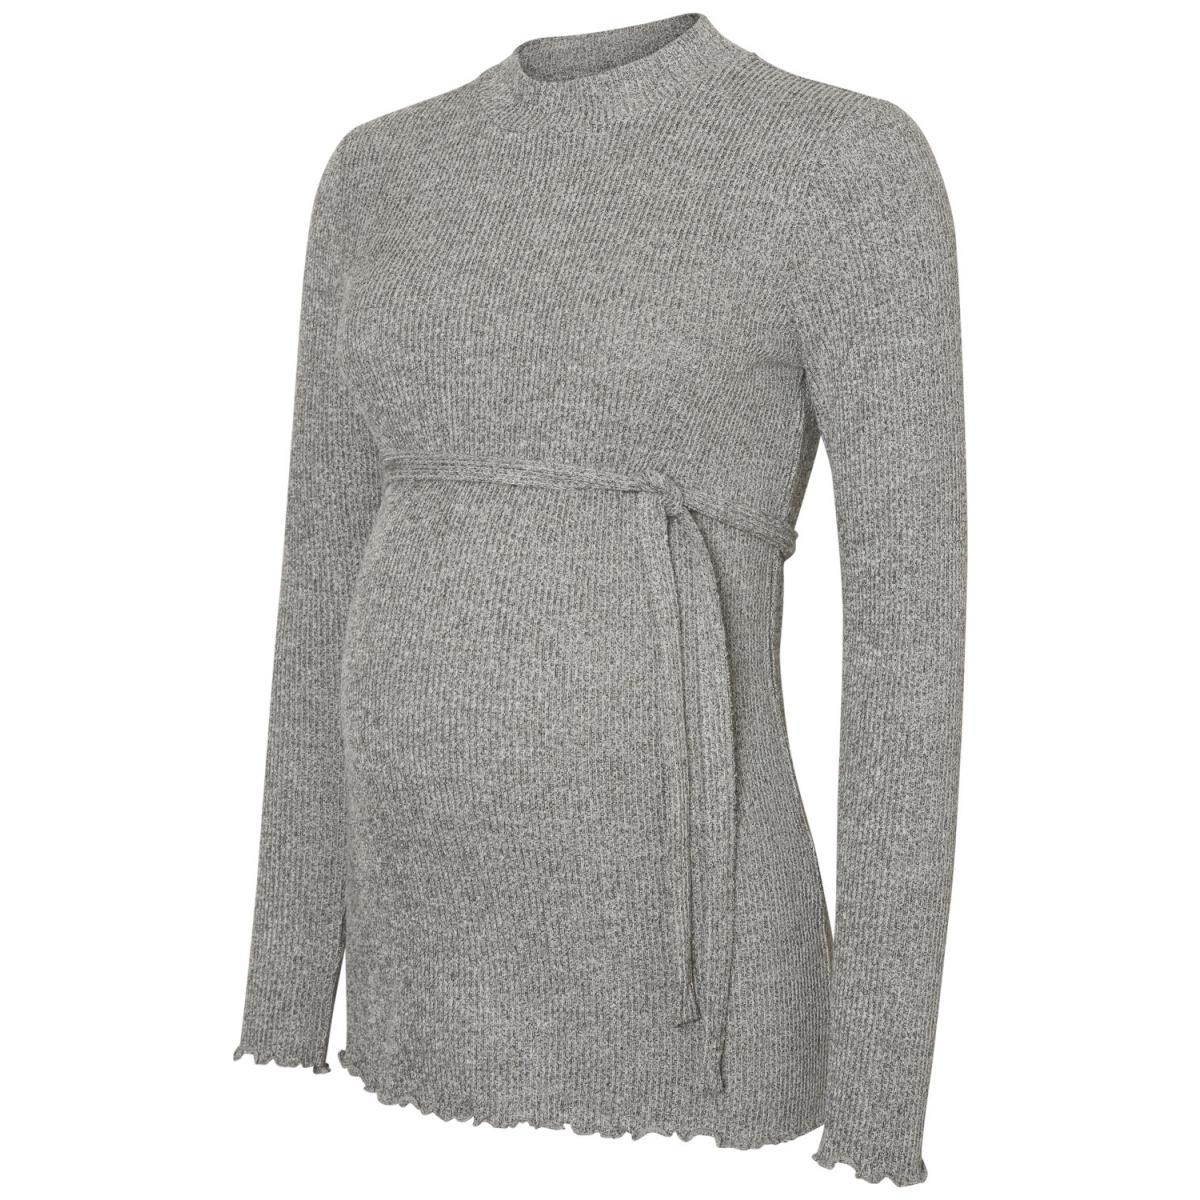 mlnevada l/s jersey top 20008017 mama-licious positie shirt medium grey melange